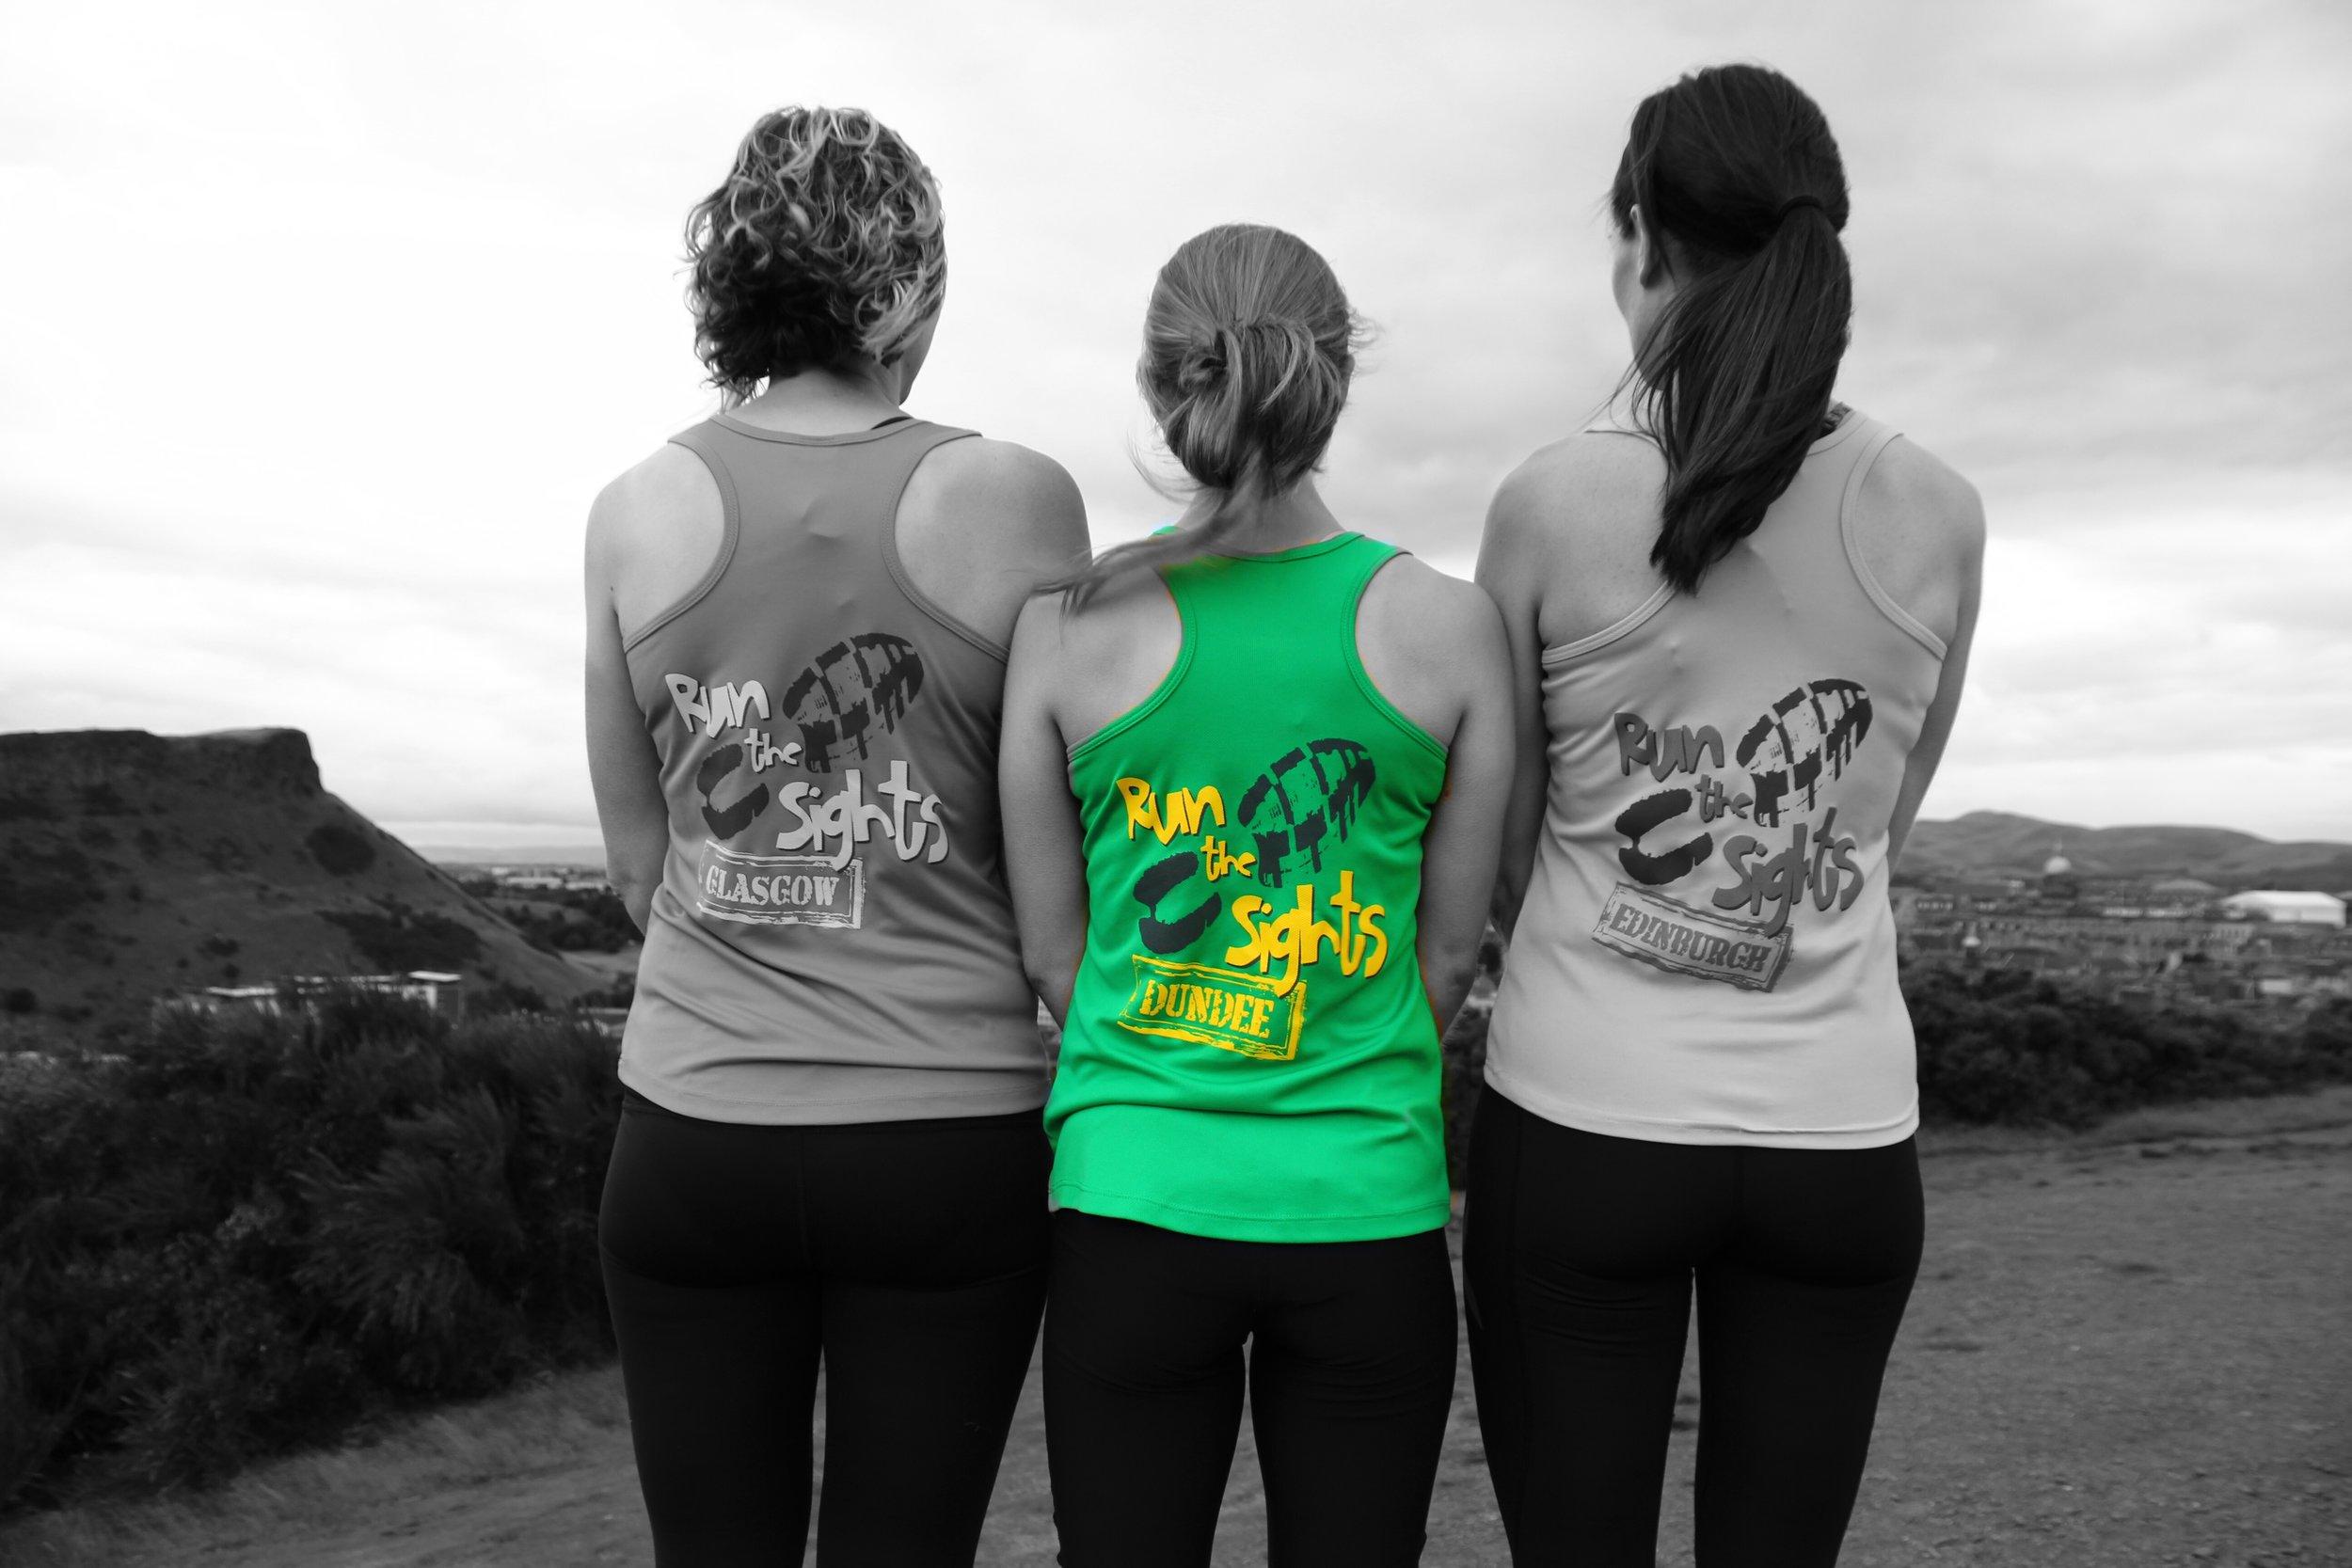 The 3 Run the Sights muskateers